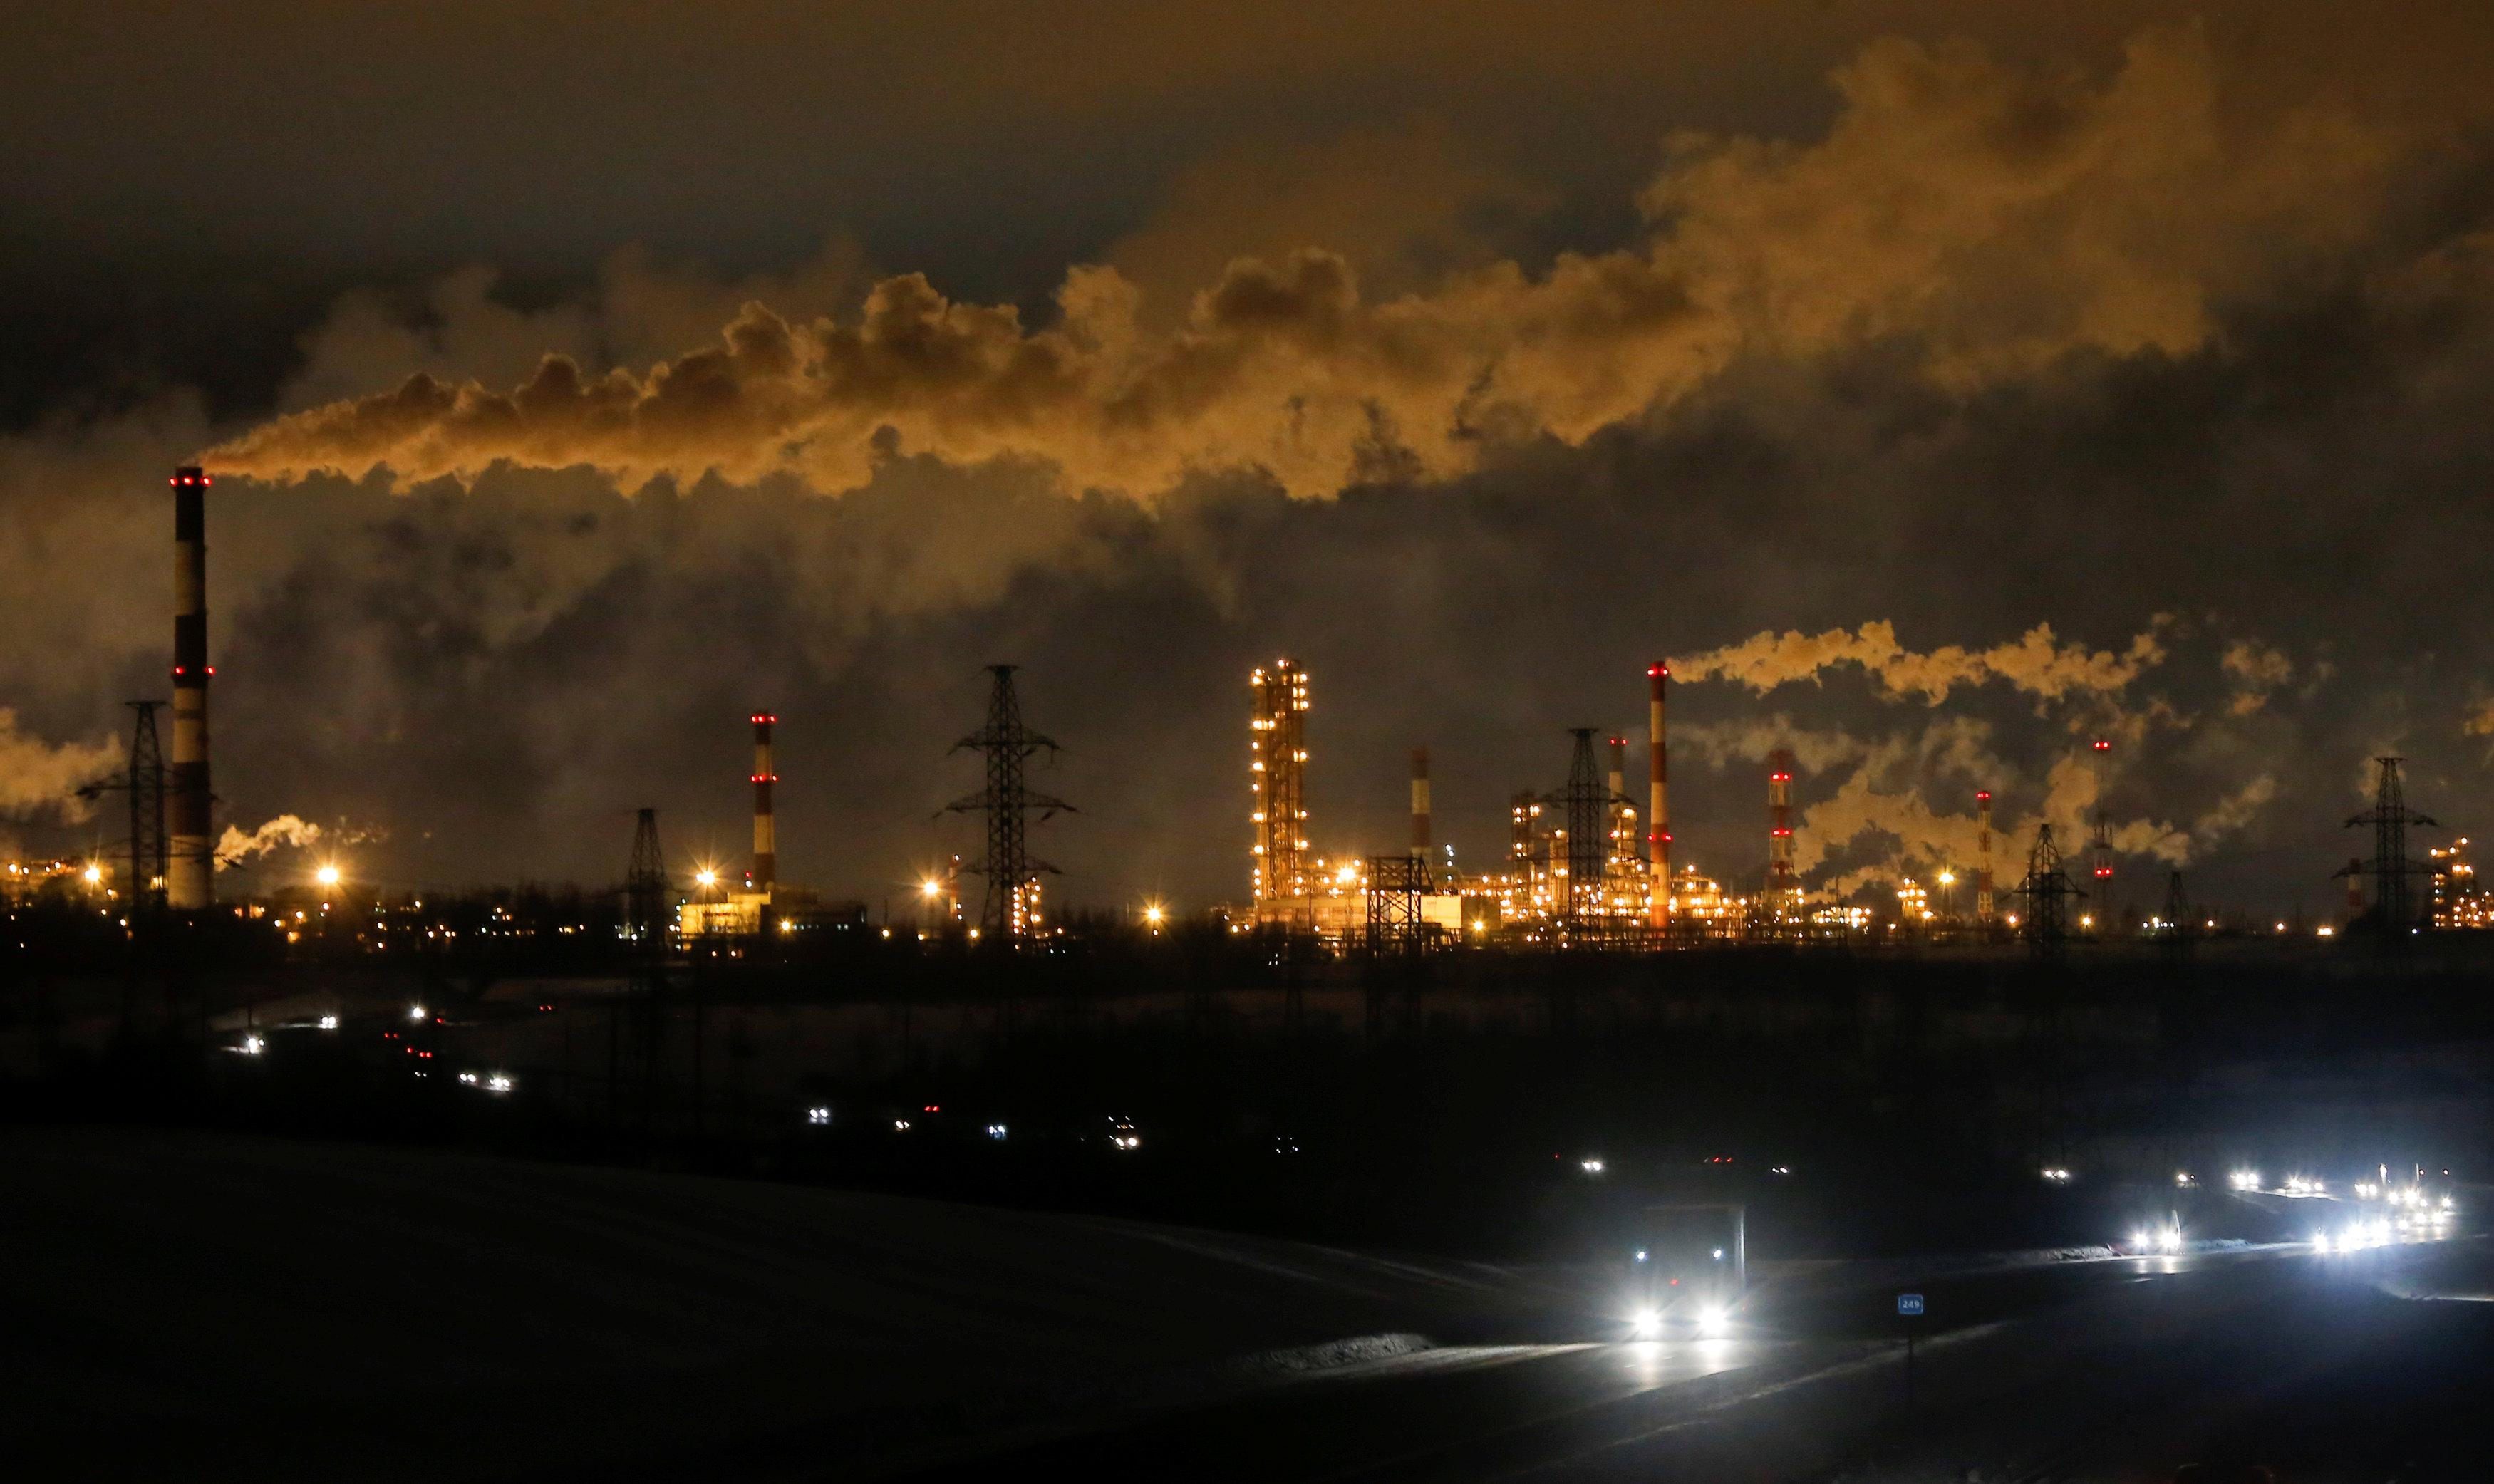 Gazprom CEO sees share of EU gas market rising despite LNG rivals